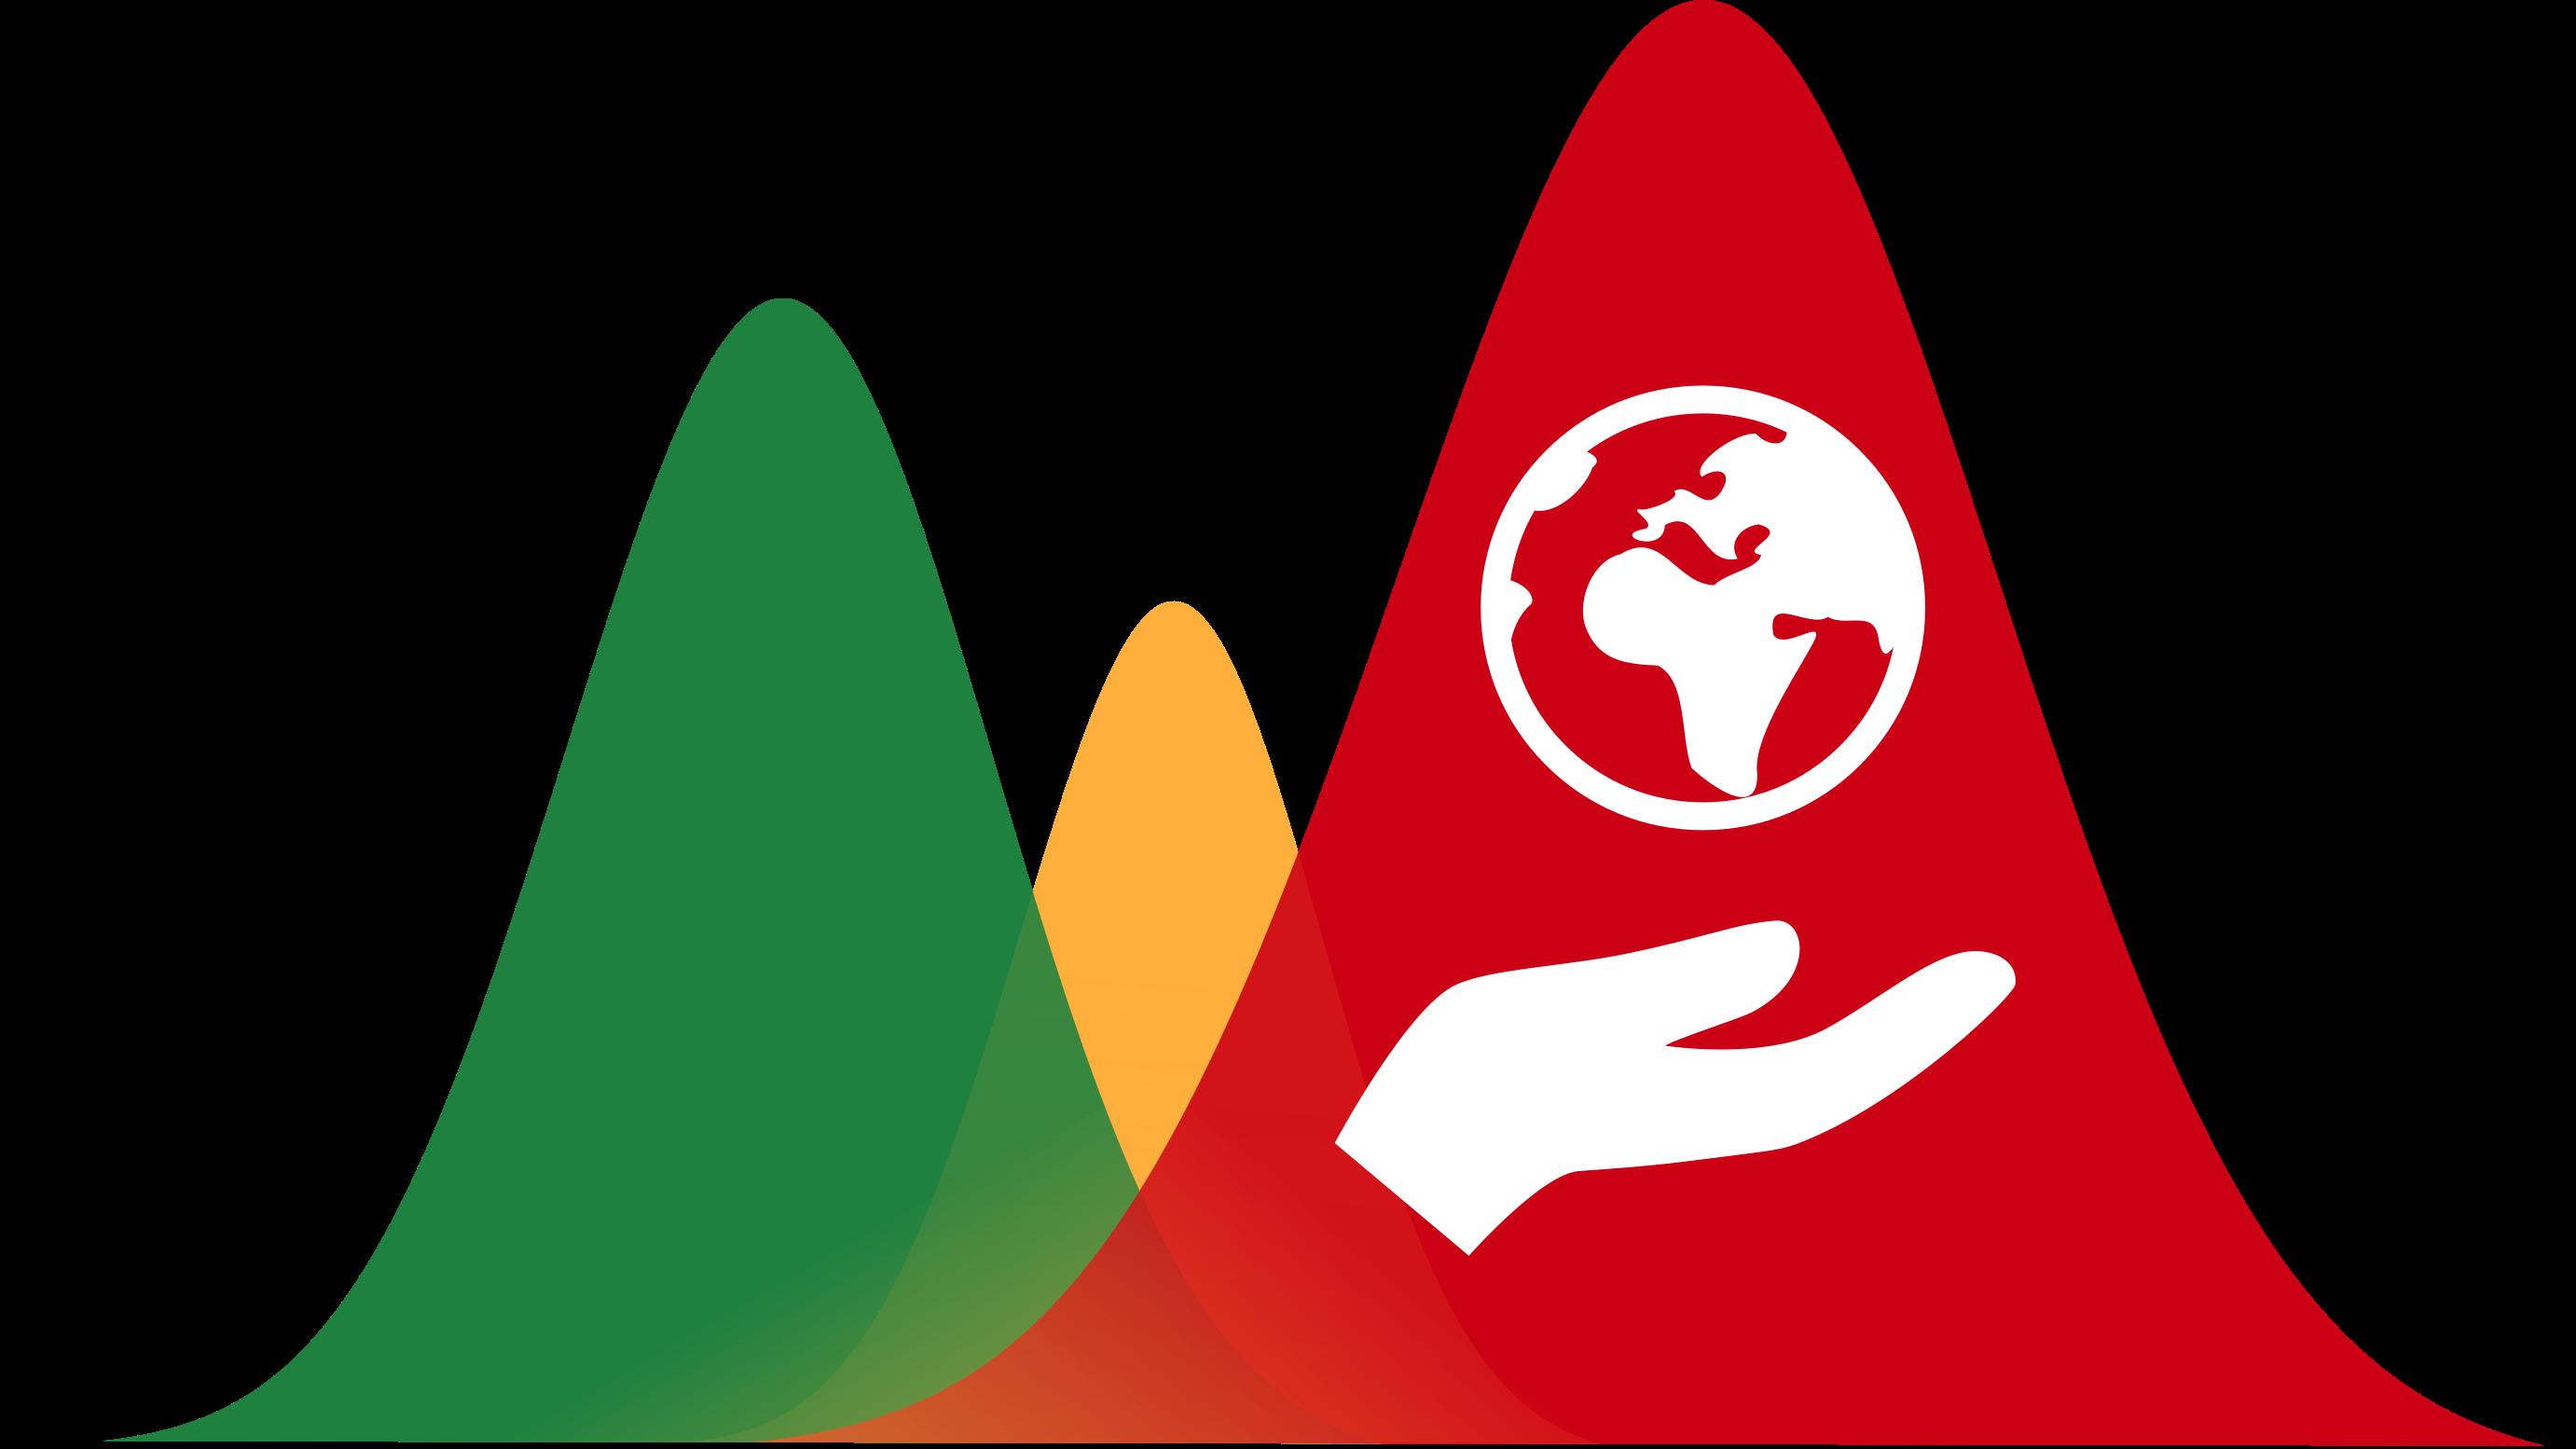 Data Science For Social Good Portugal